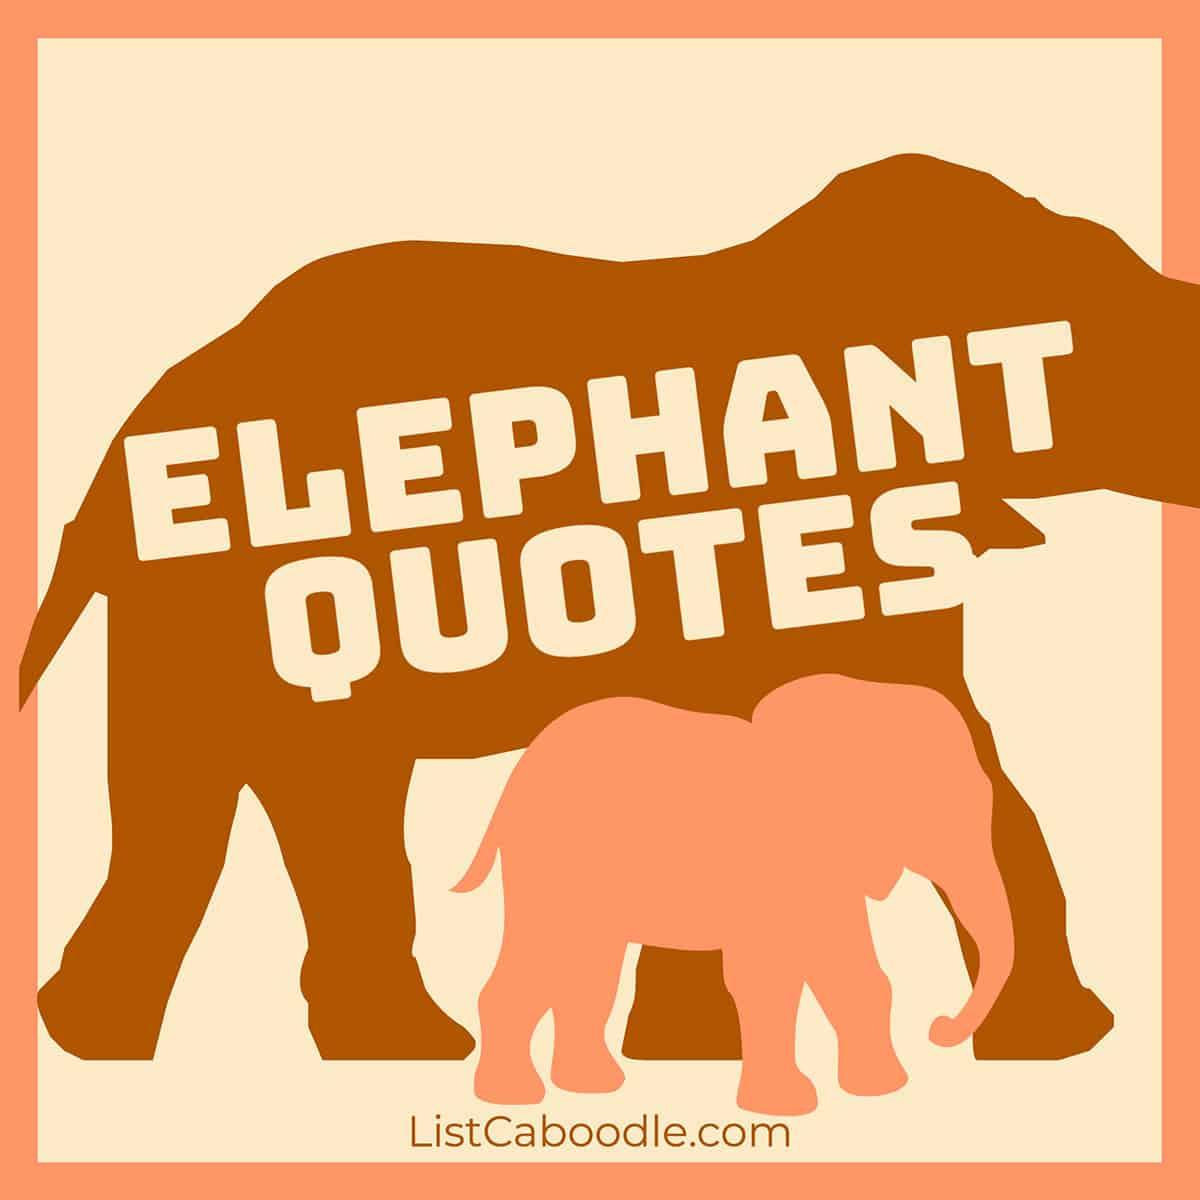 Elephant quotes image